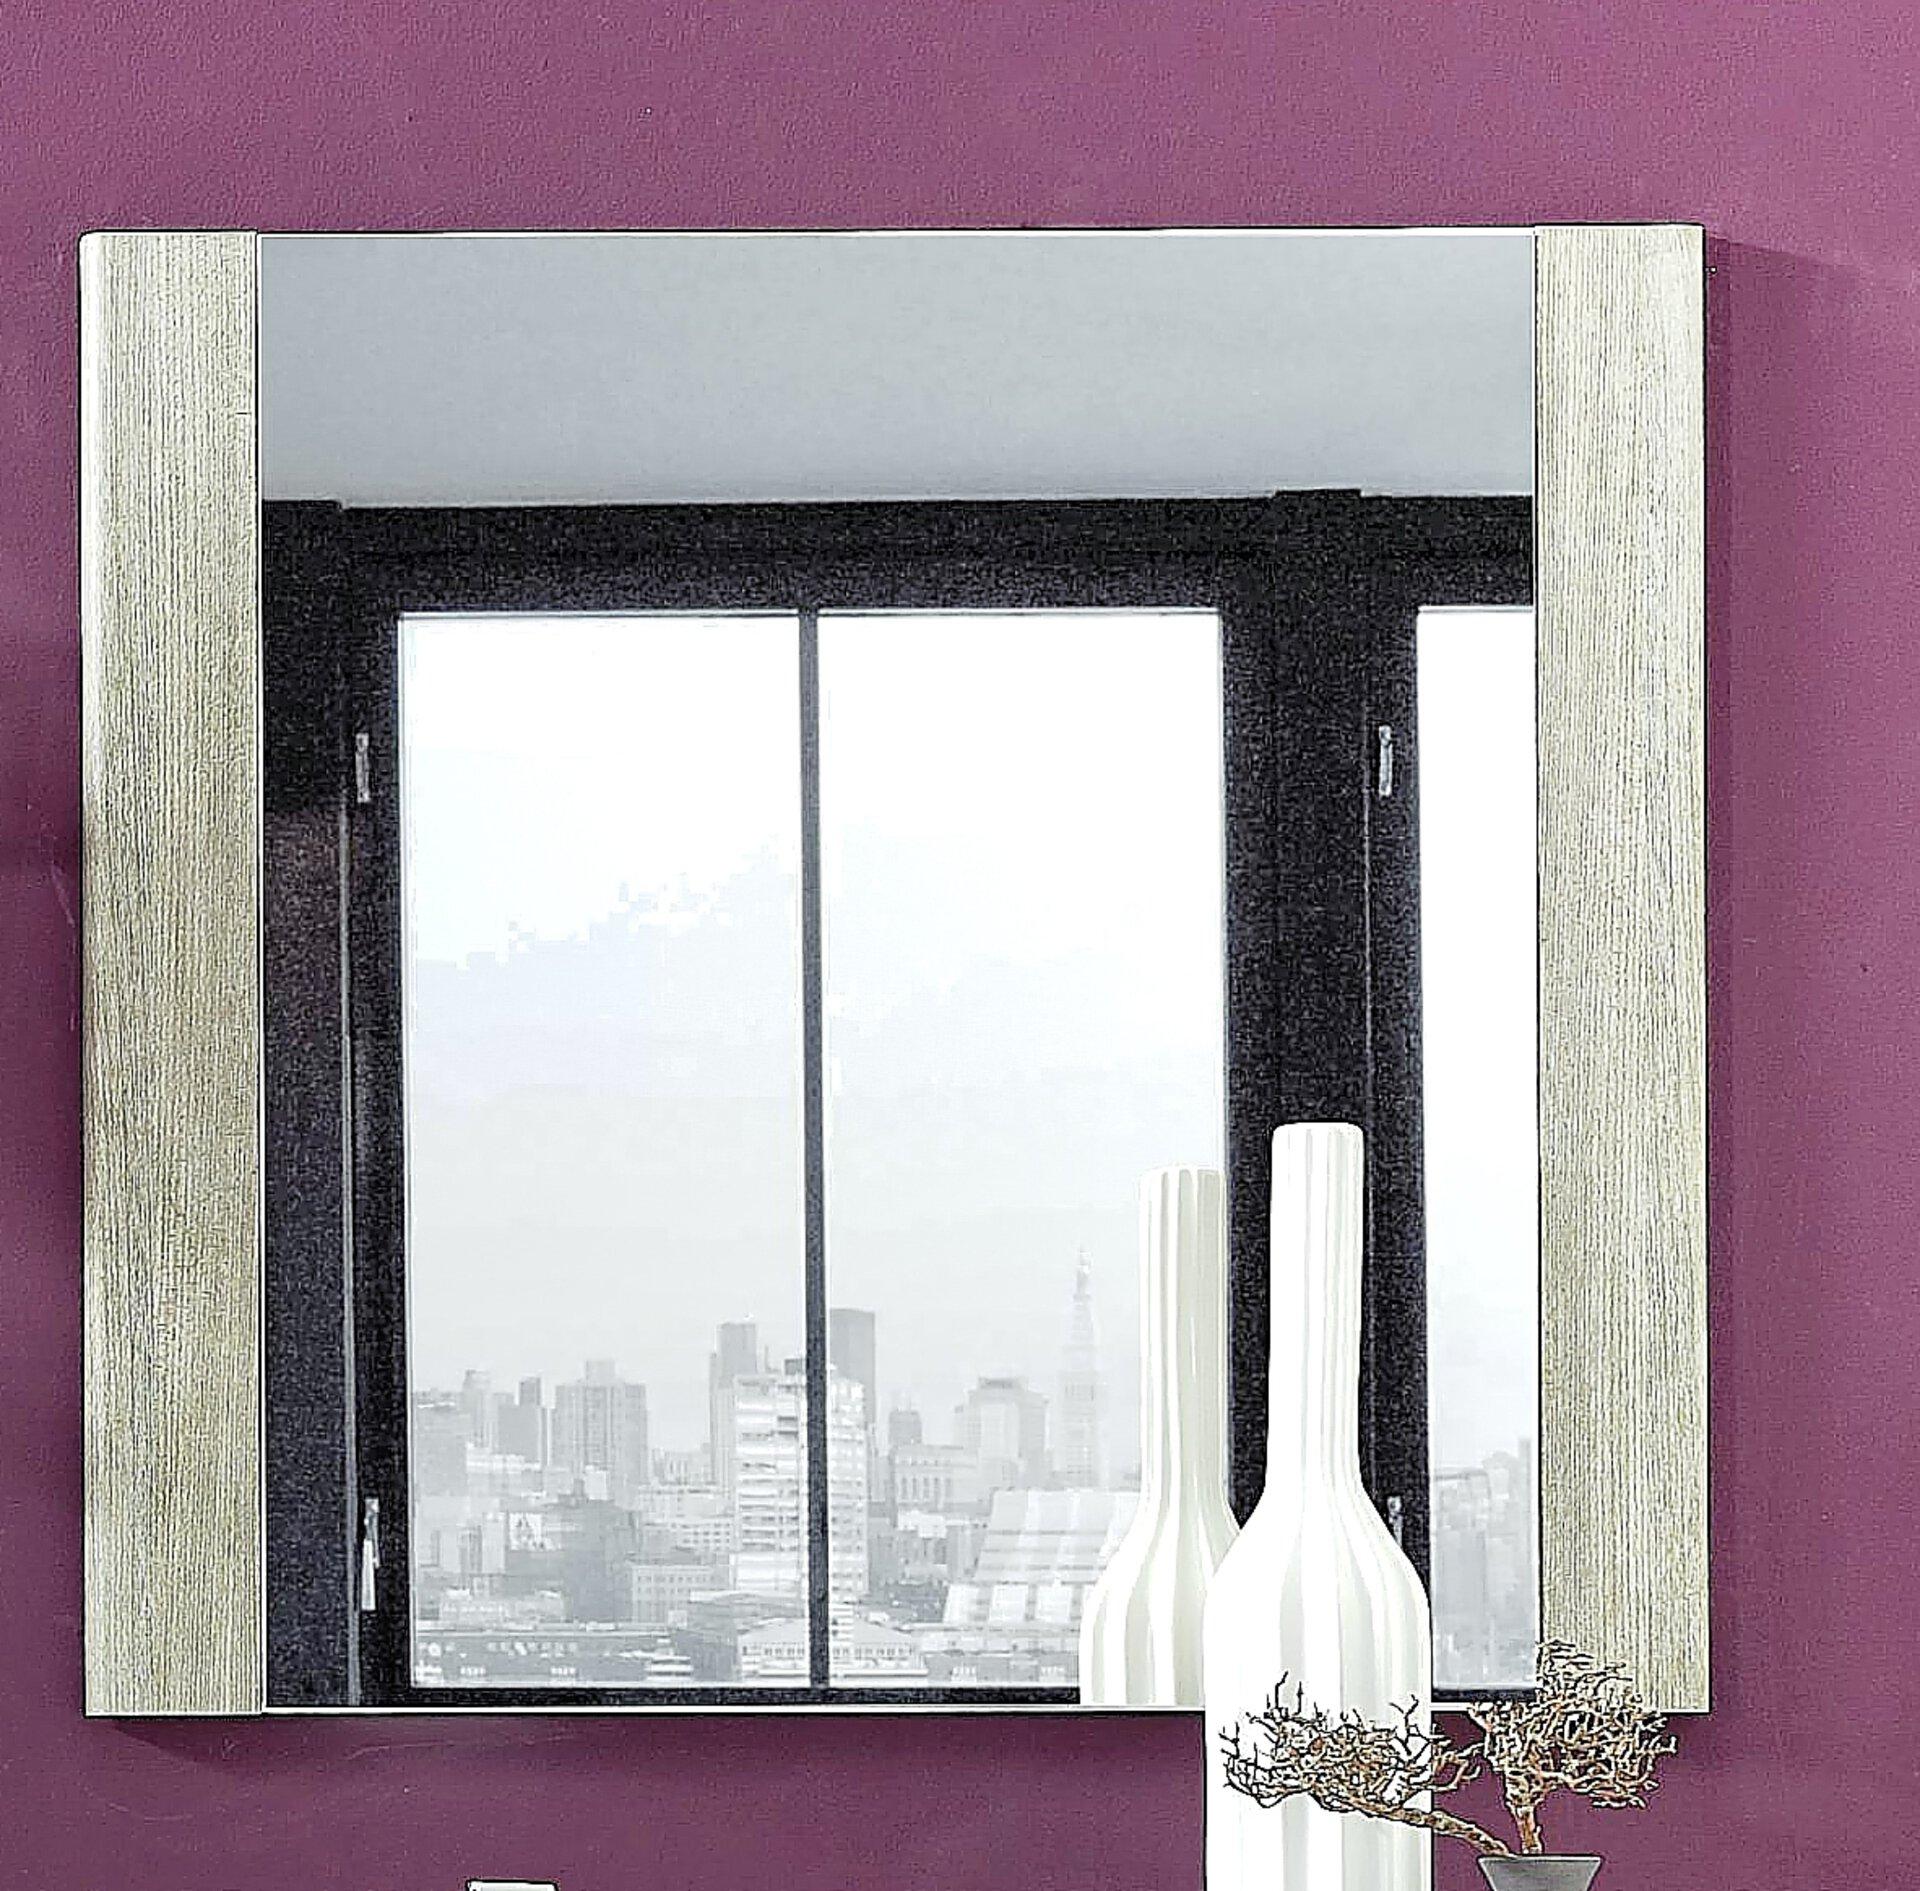 Spiegel PETRINA Vito Holzwerkstoff mehrfarbig 3 x 70 x 76 cm